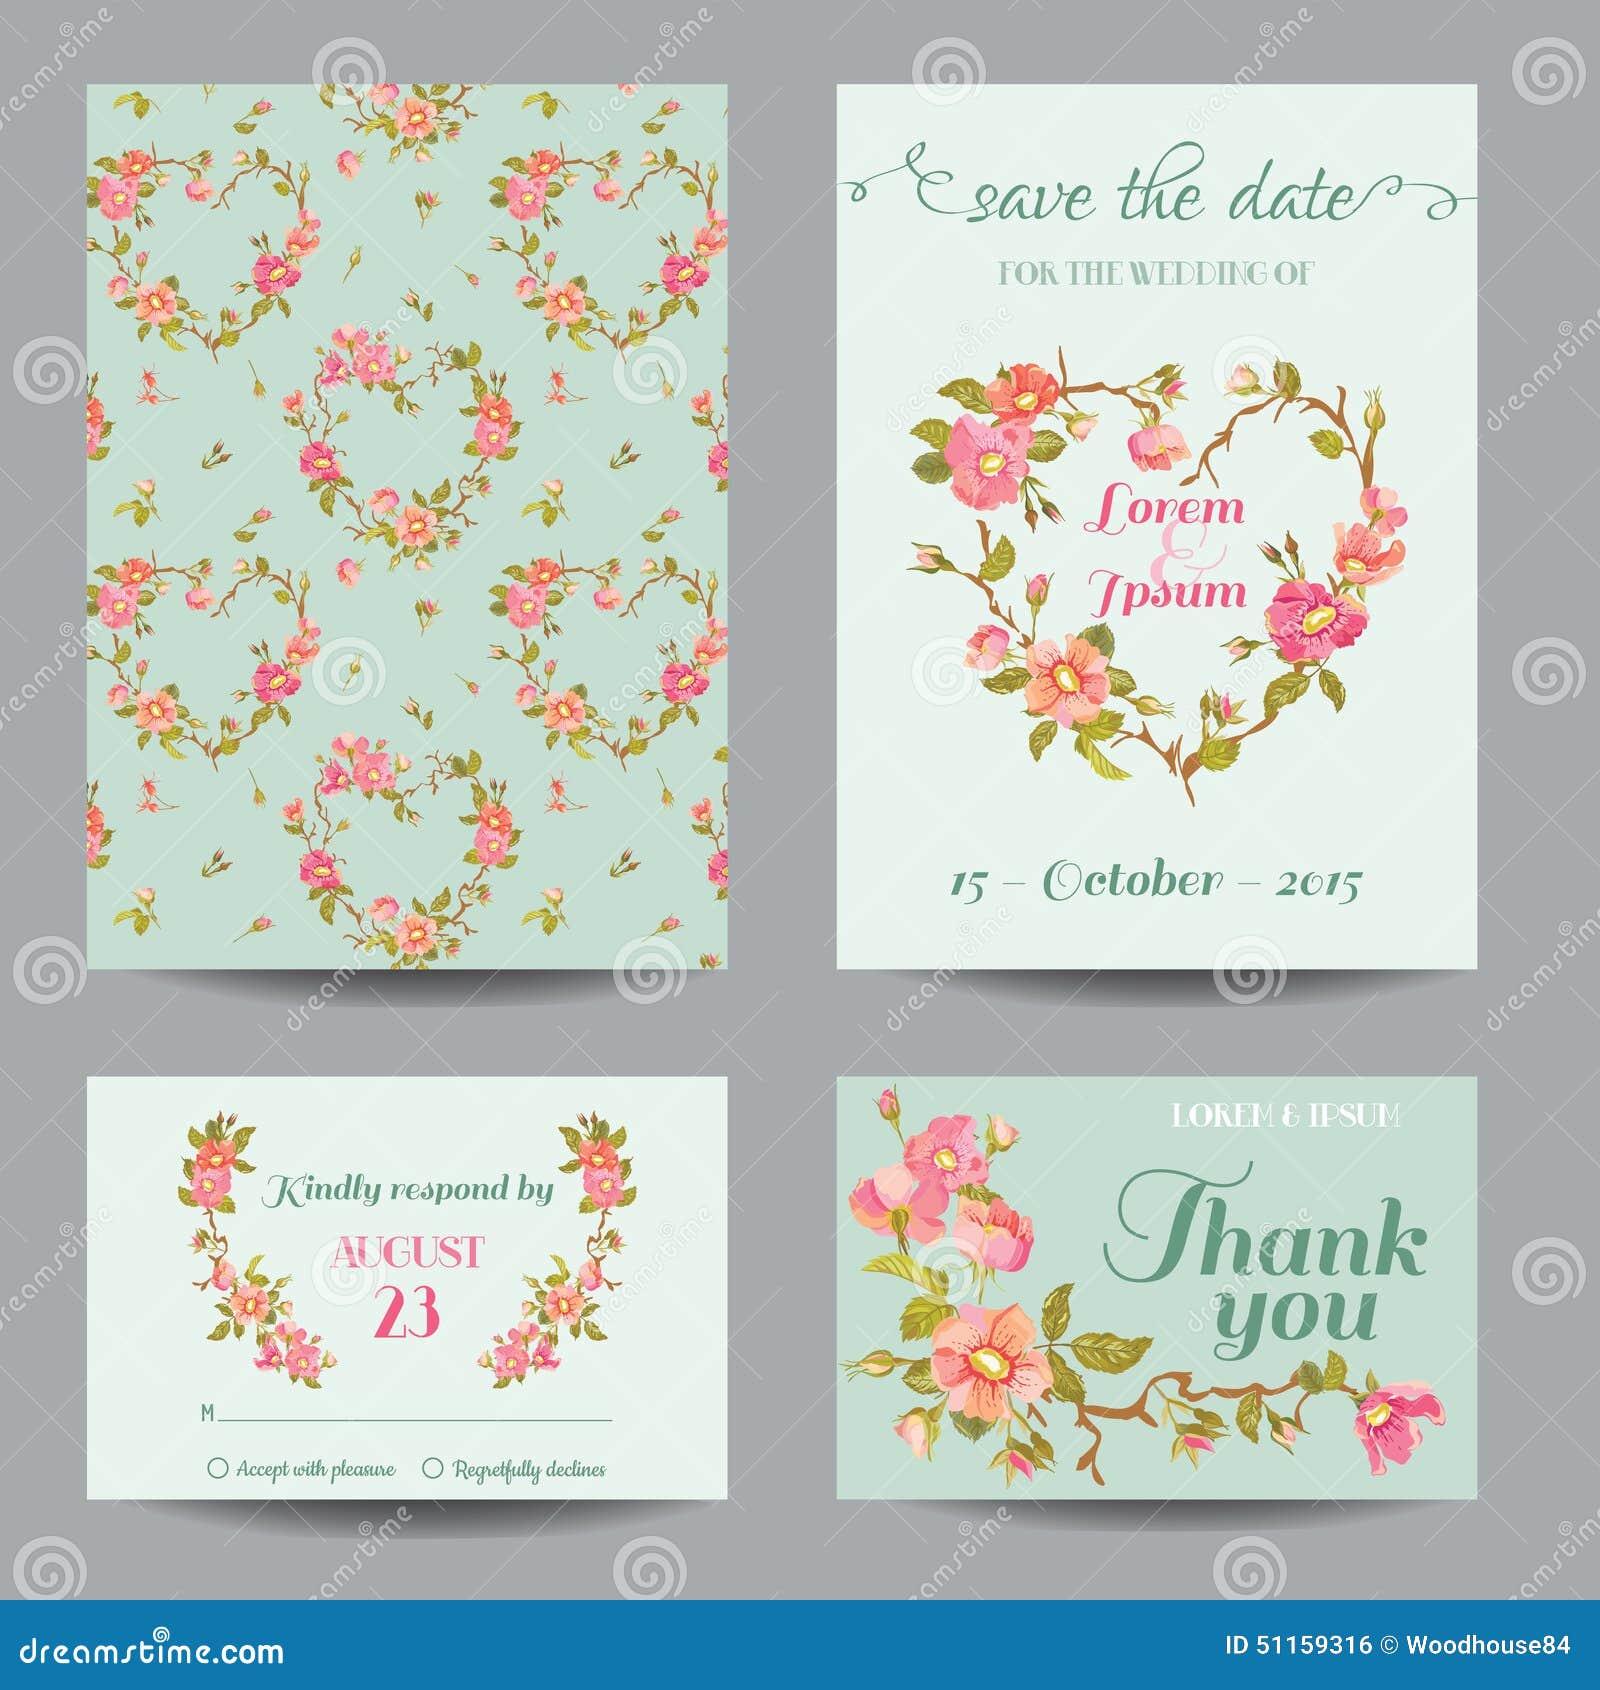 Invitation-Congratulation Card Set Stock Illustration - Illustration ...